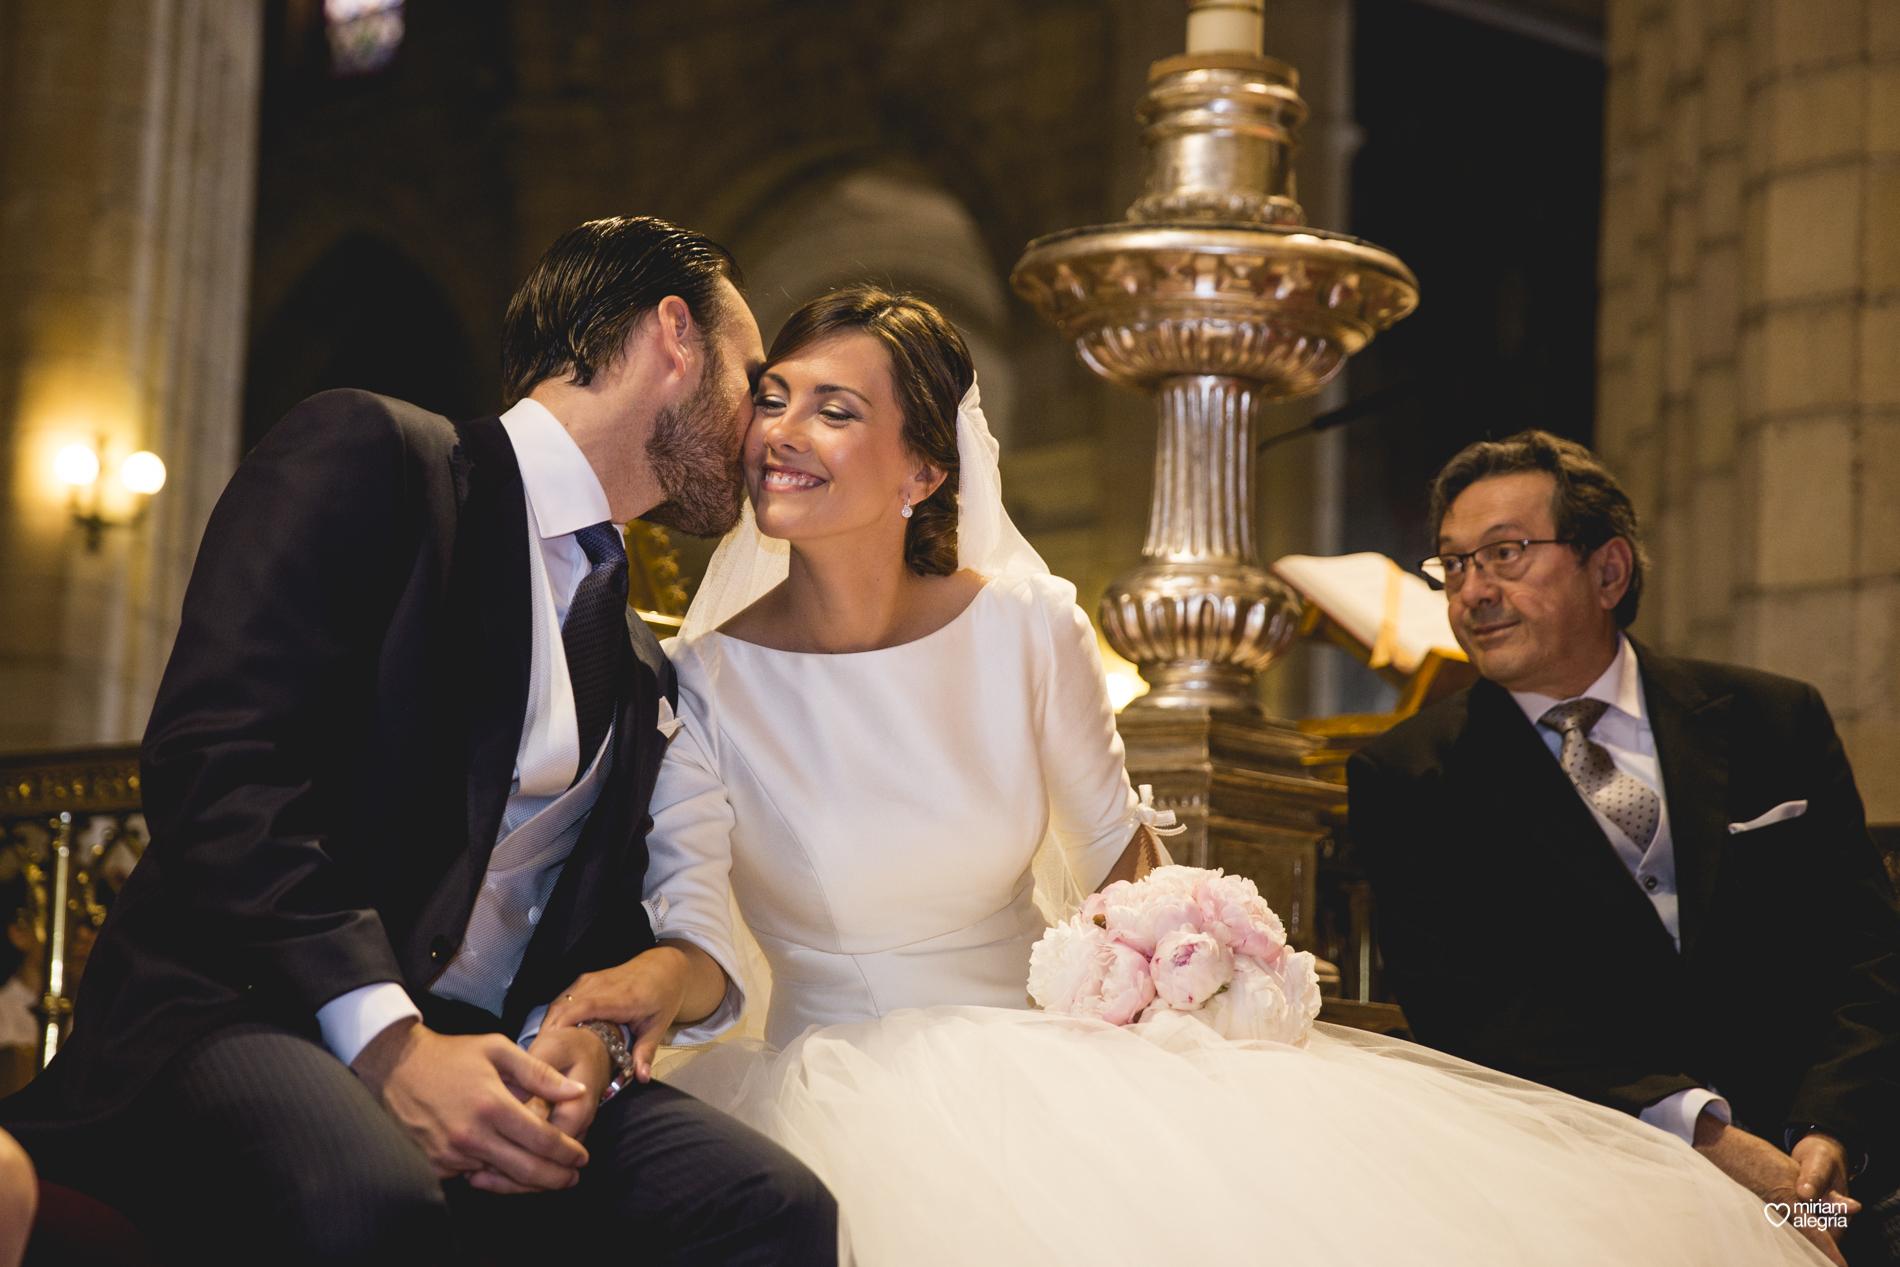 boda-en-la-catedral-de-murcia-miriam-alegria-fotografos-boda-murcia-53